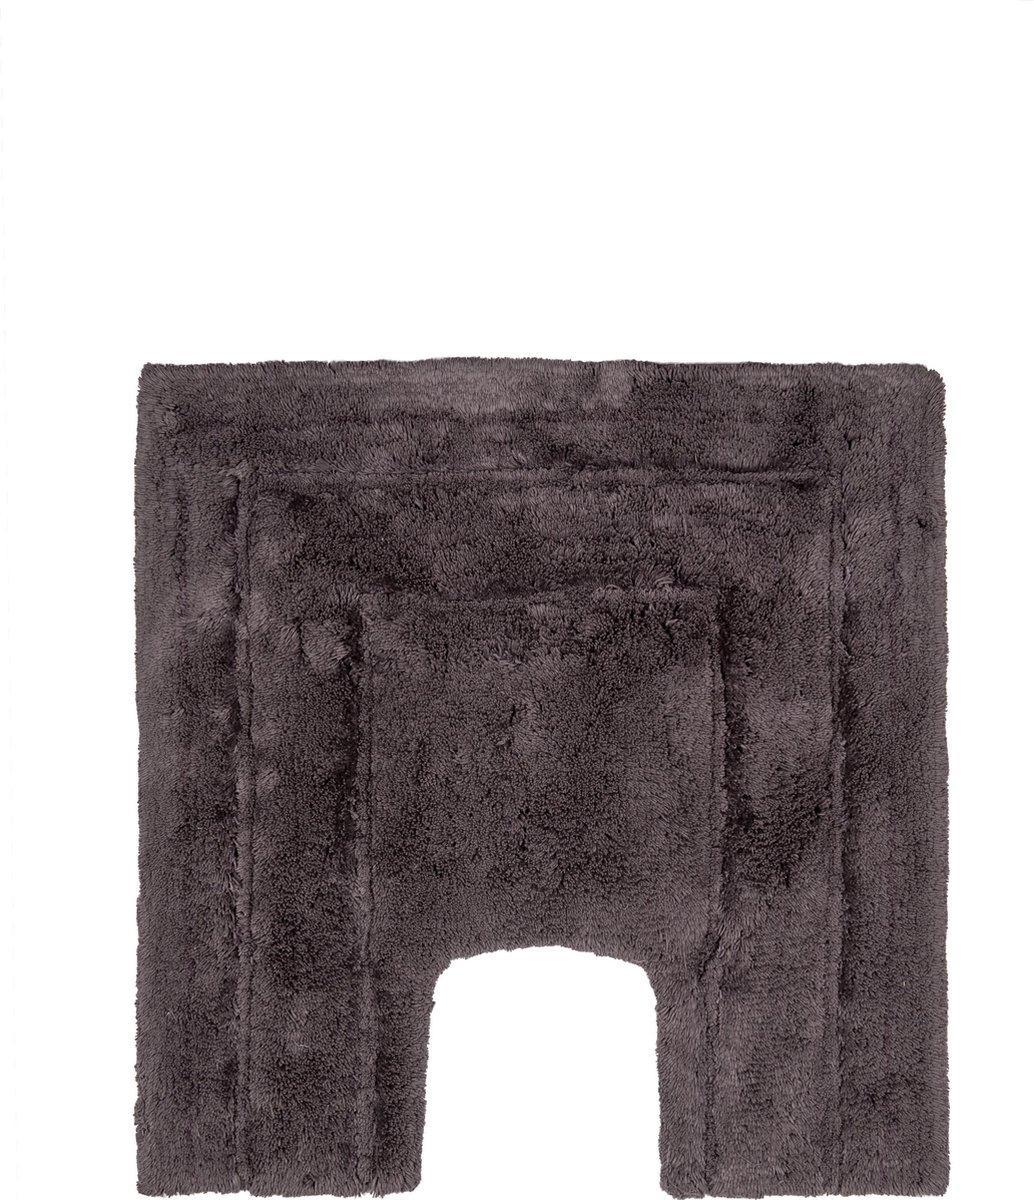 Caress - WC-mat - Donkergrijs - 59 x 59 cm - Casilin